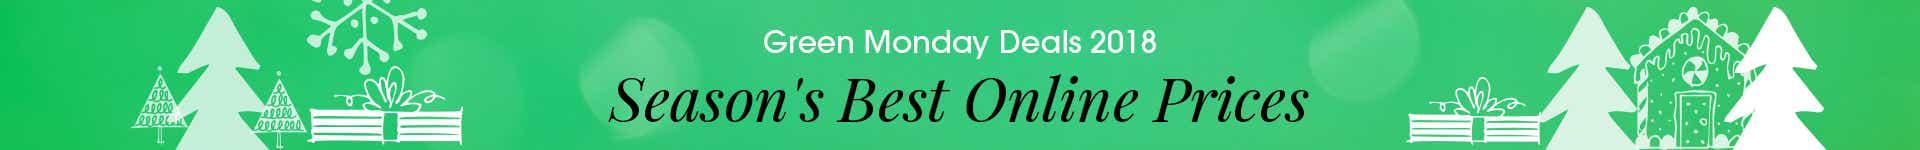 Green Monday Deals 2017